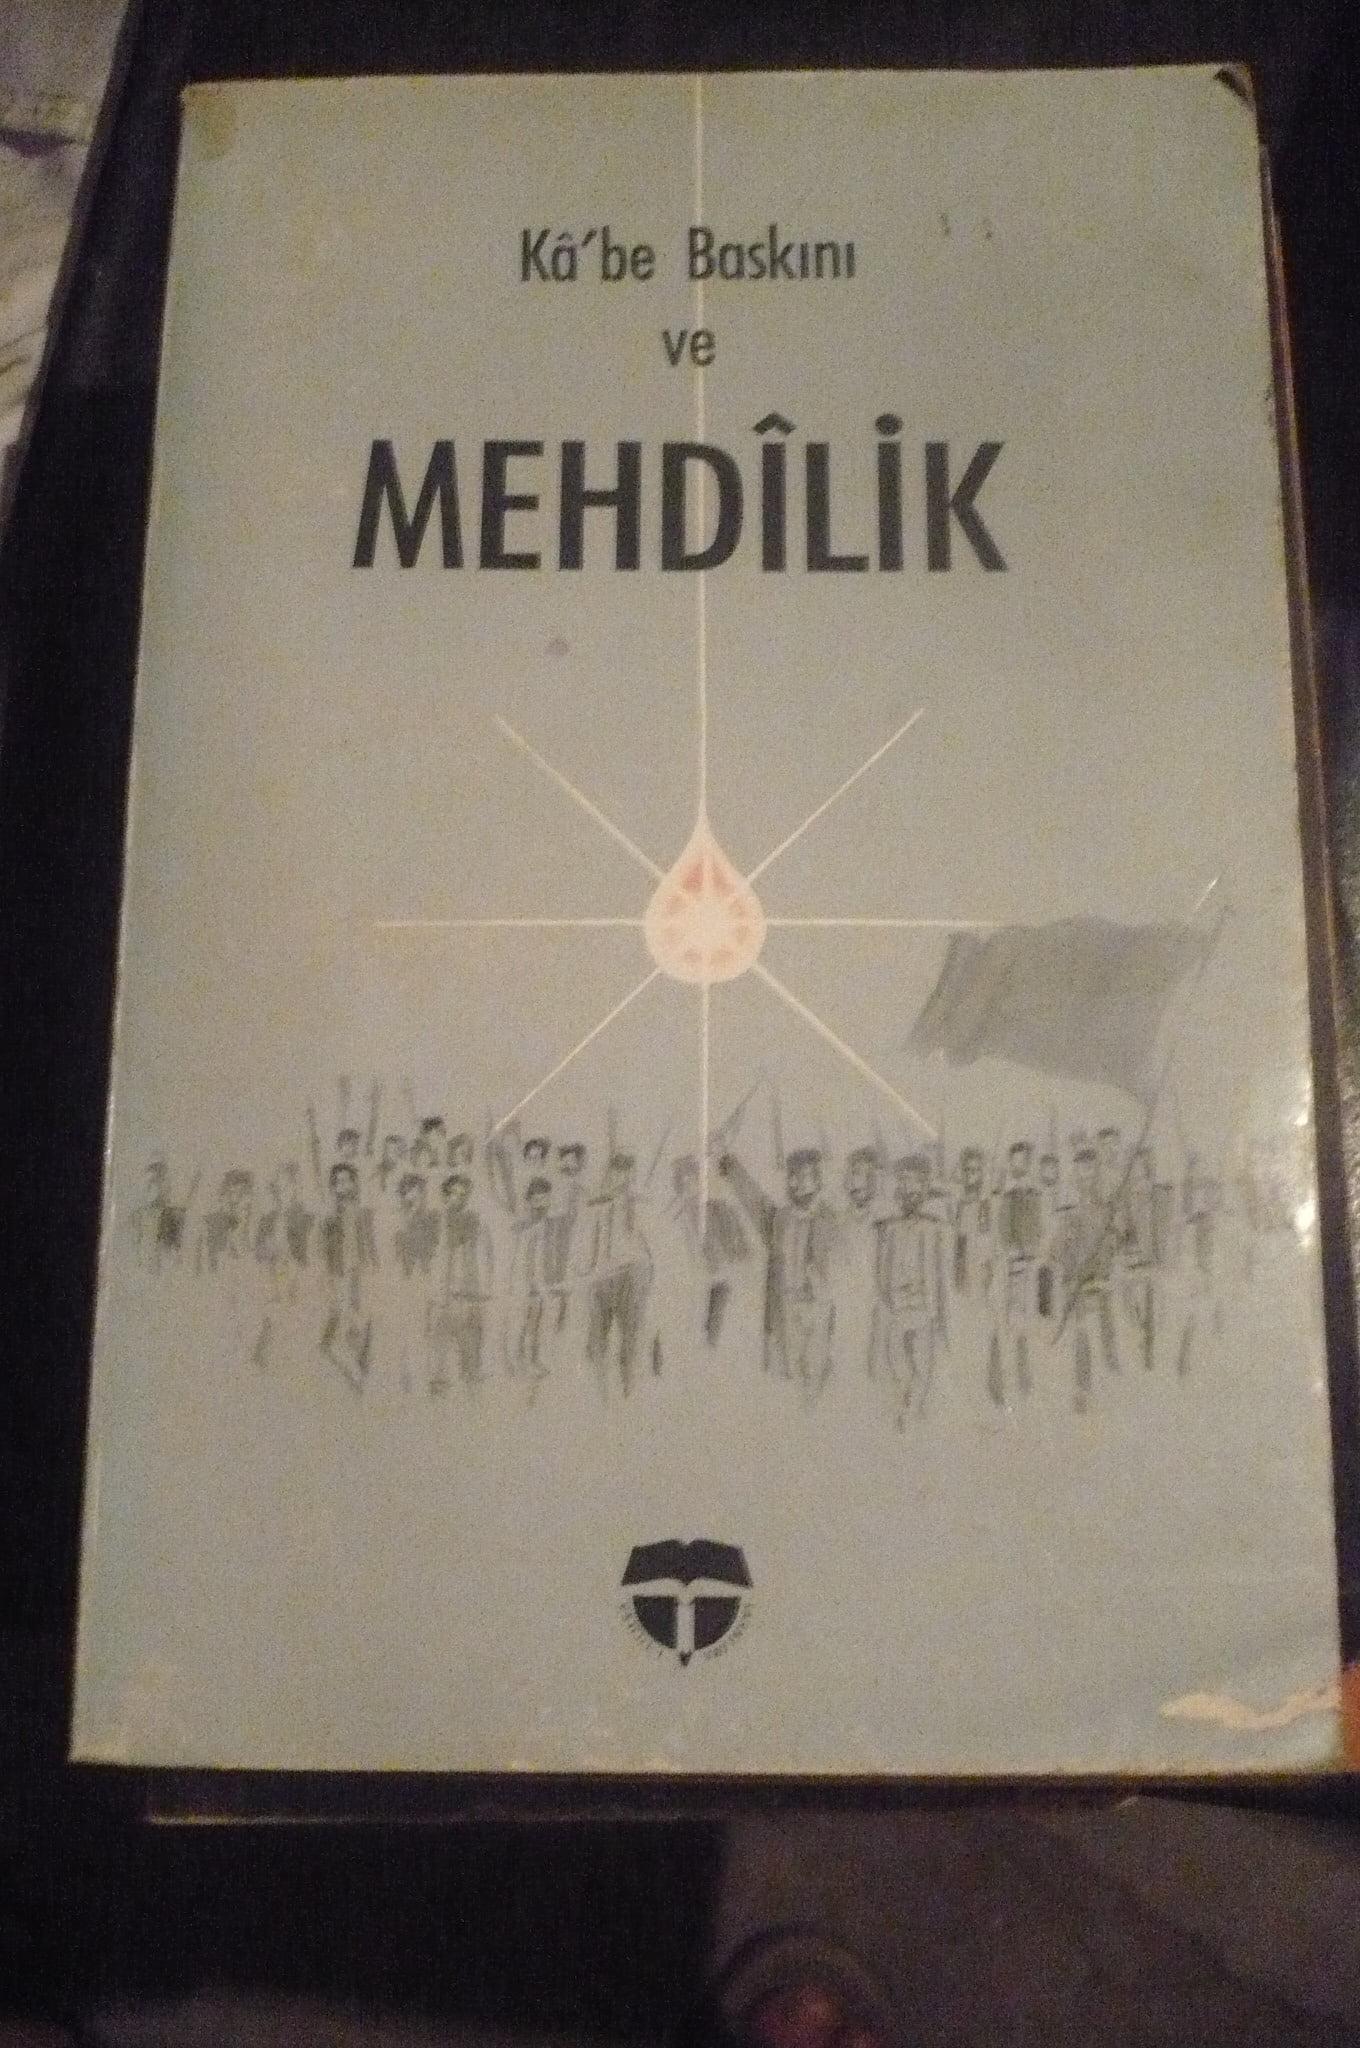 KABE BASKINI VE MEHDİLİK/Ahmet Faruk/ 15 tl